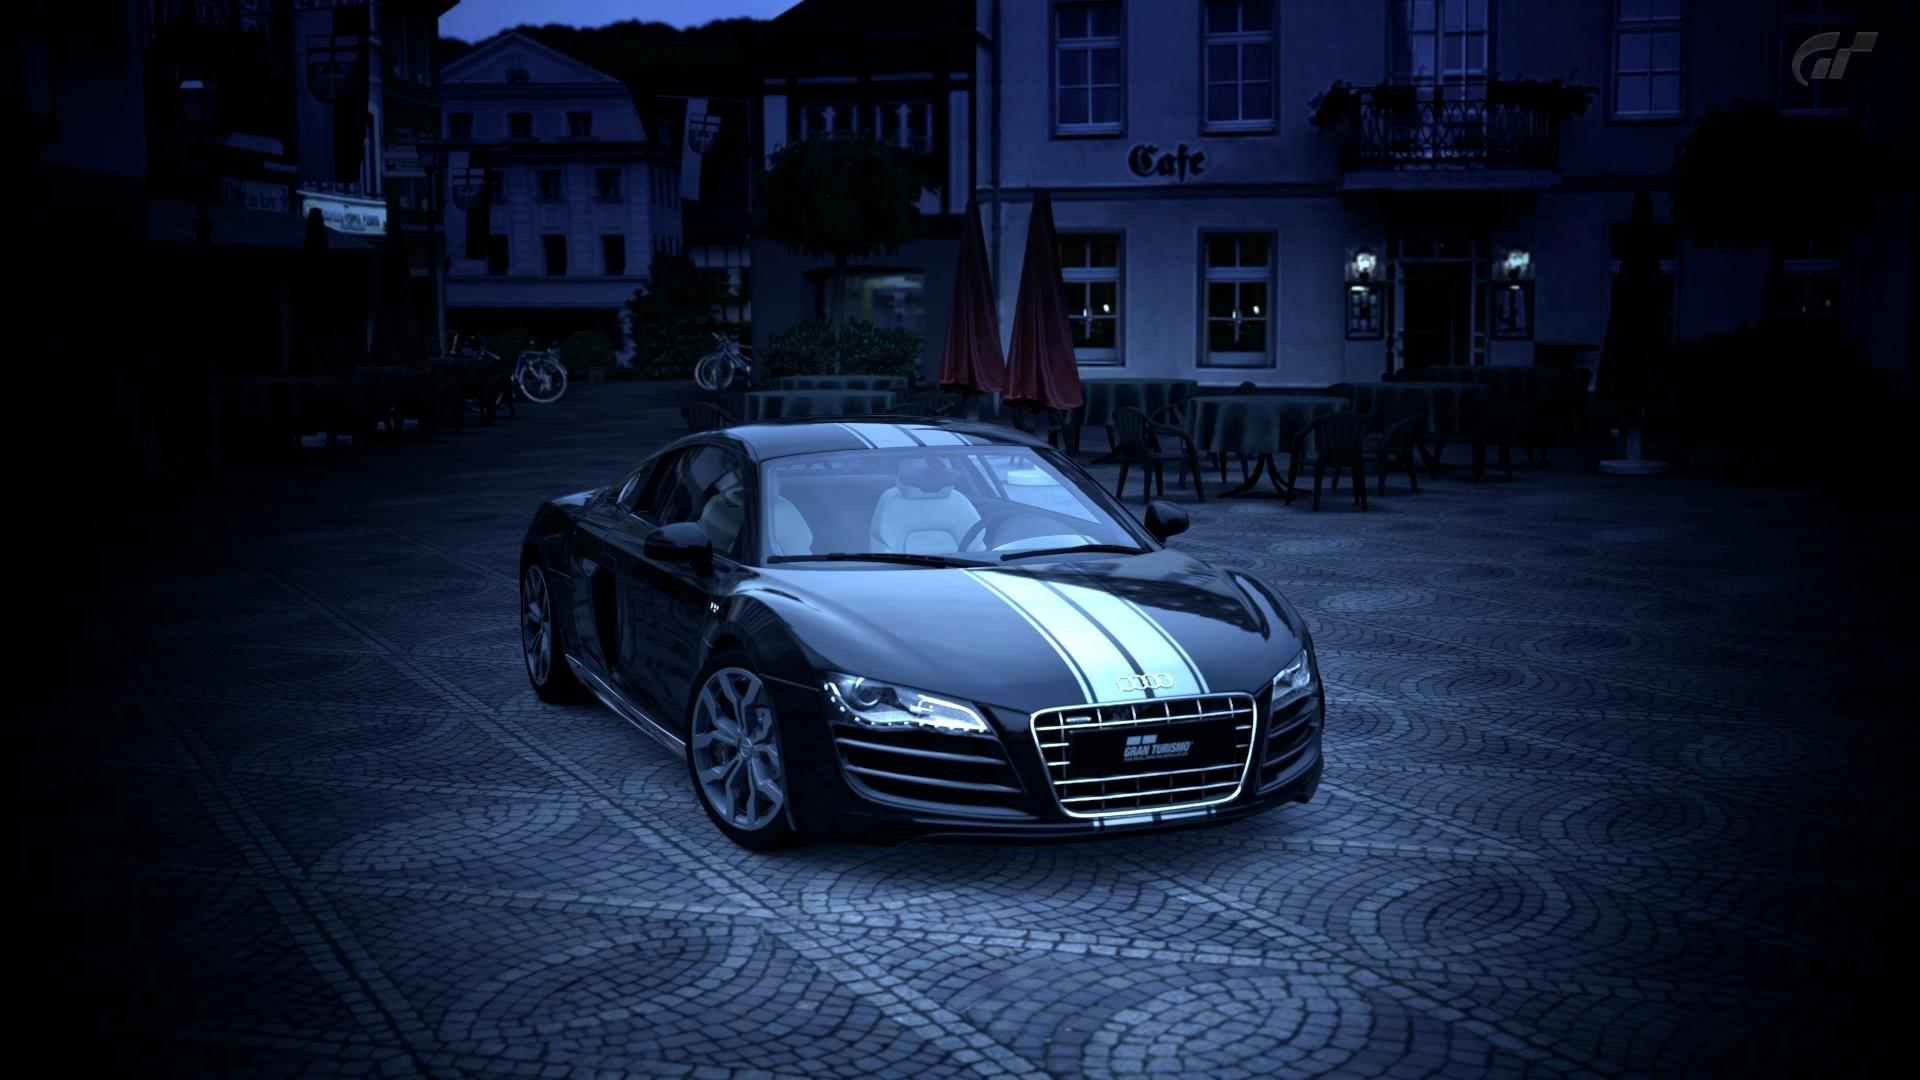 HD Black Wallpaper